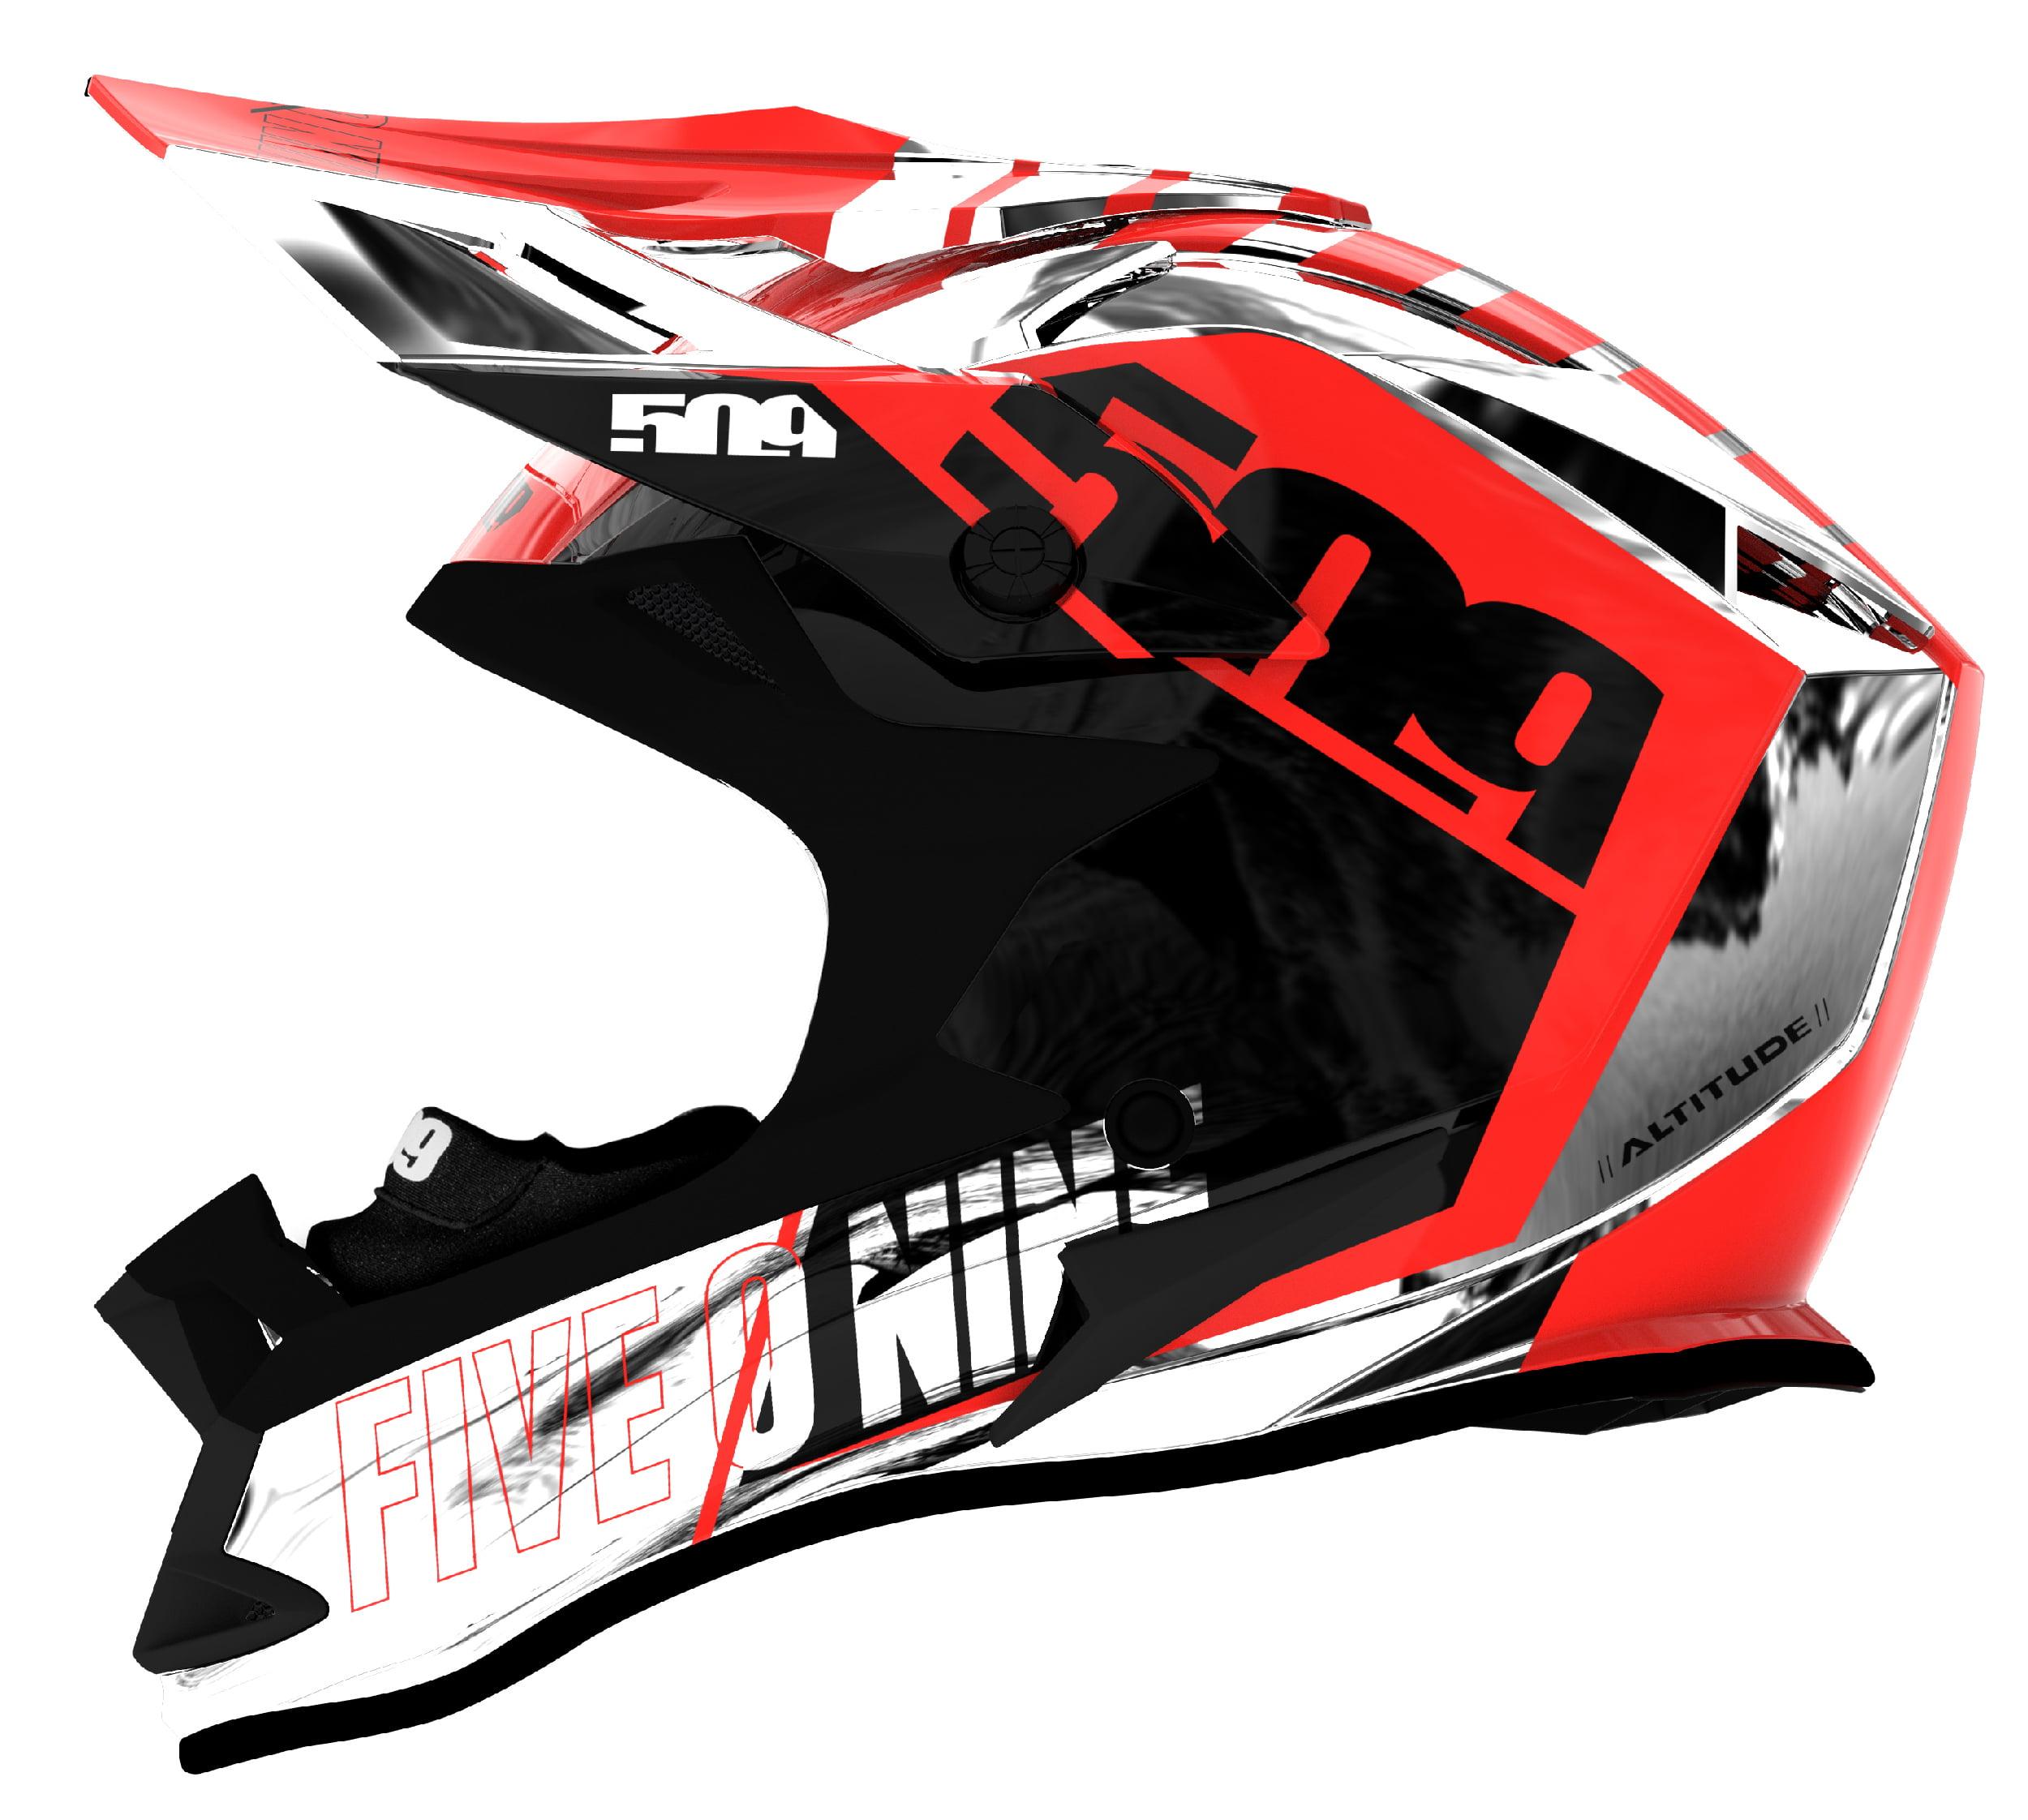 2XL Stamp 509 Altitude Snowmobiling Helmet